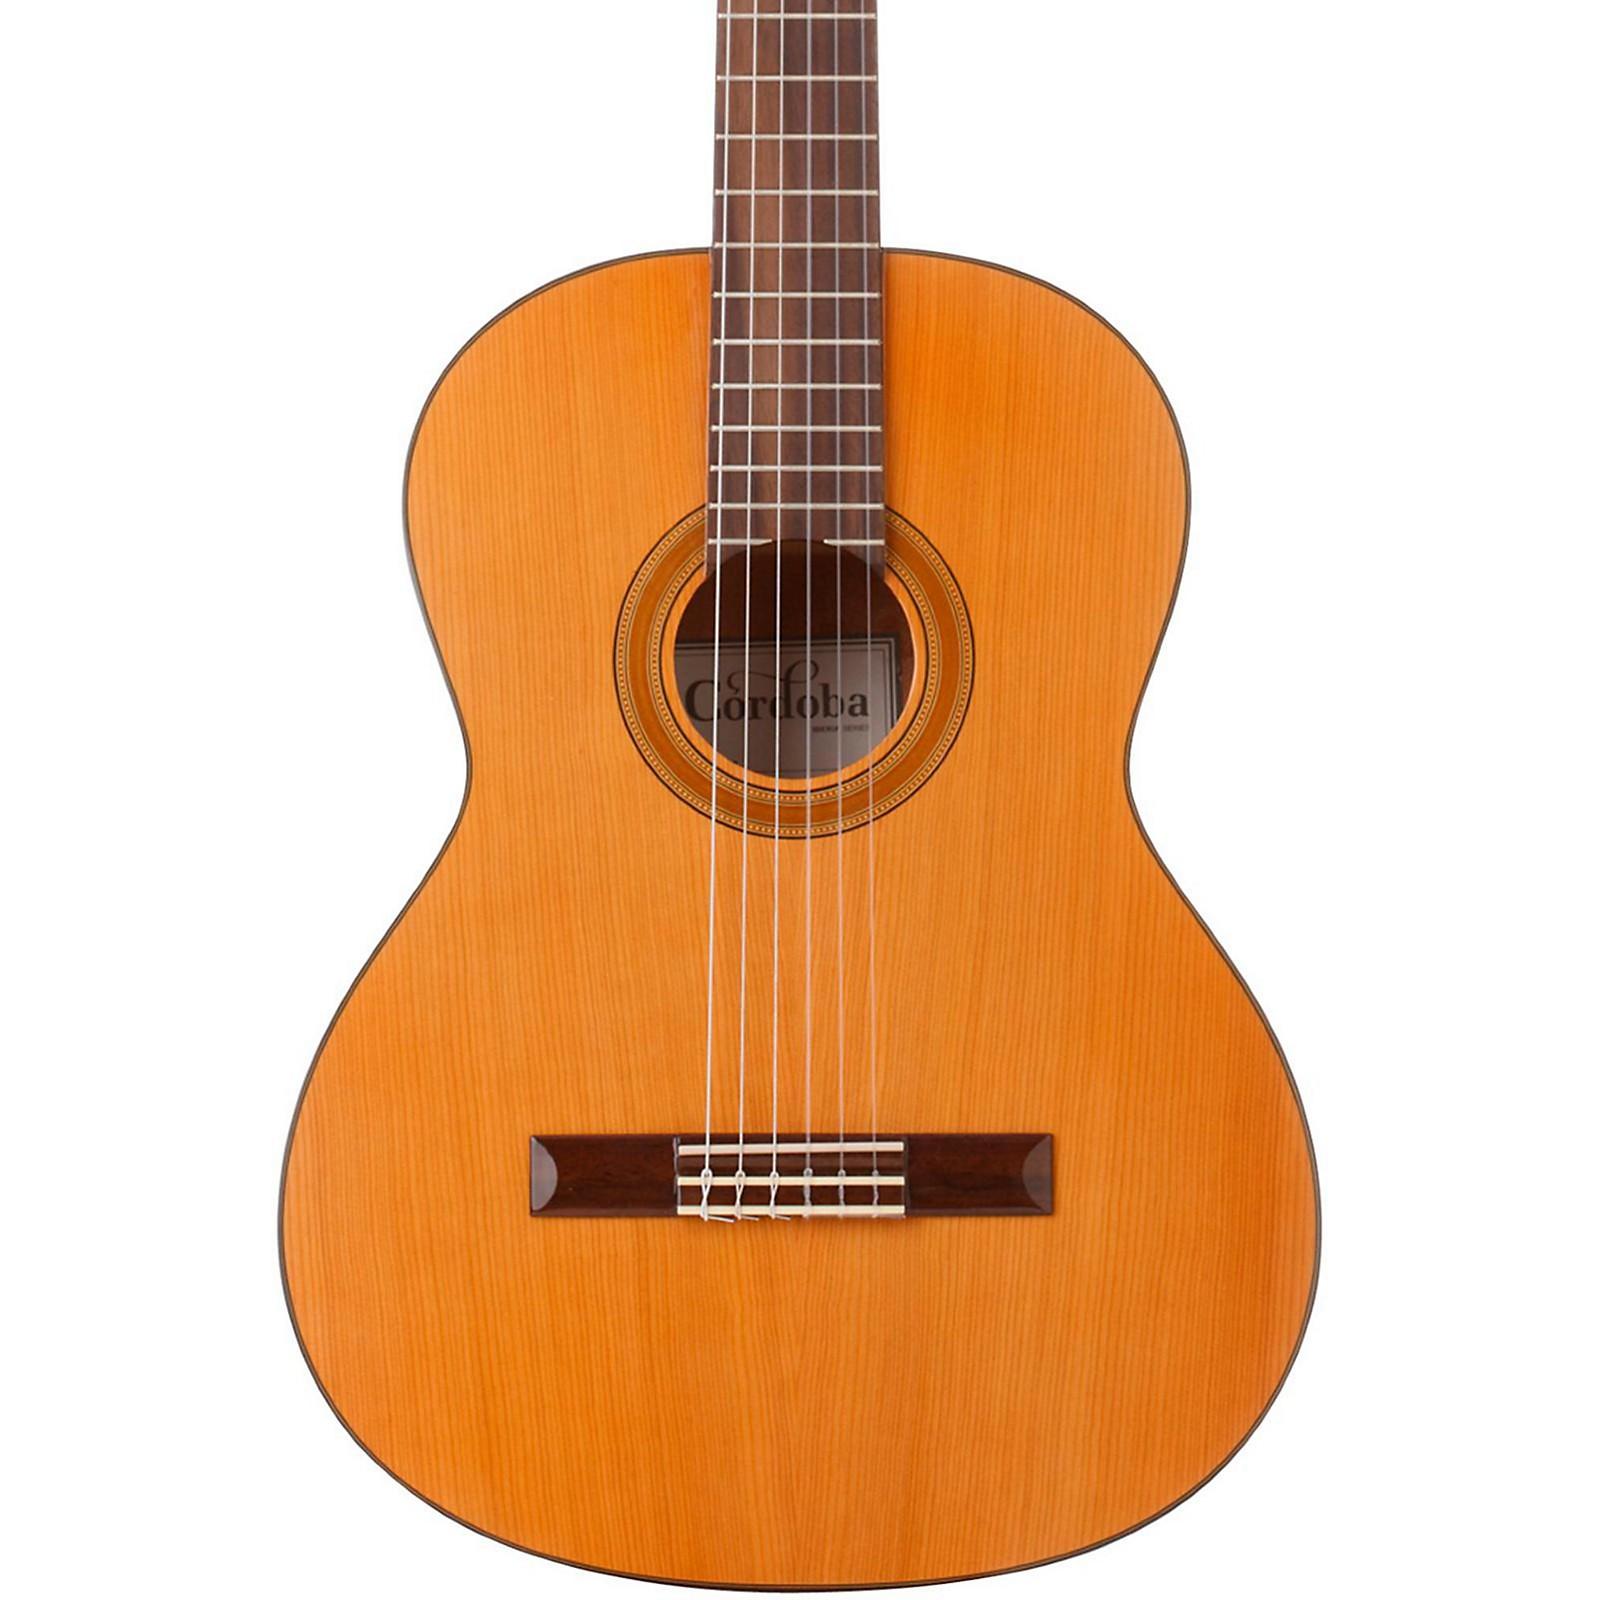 General ABS Plastic Acoustic Classical Guitar Saddle Black